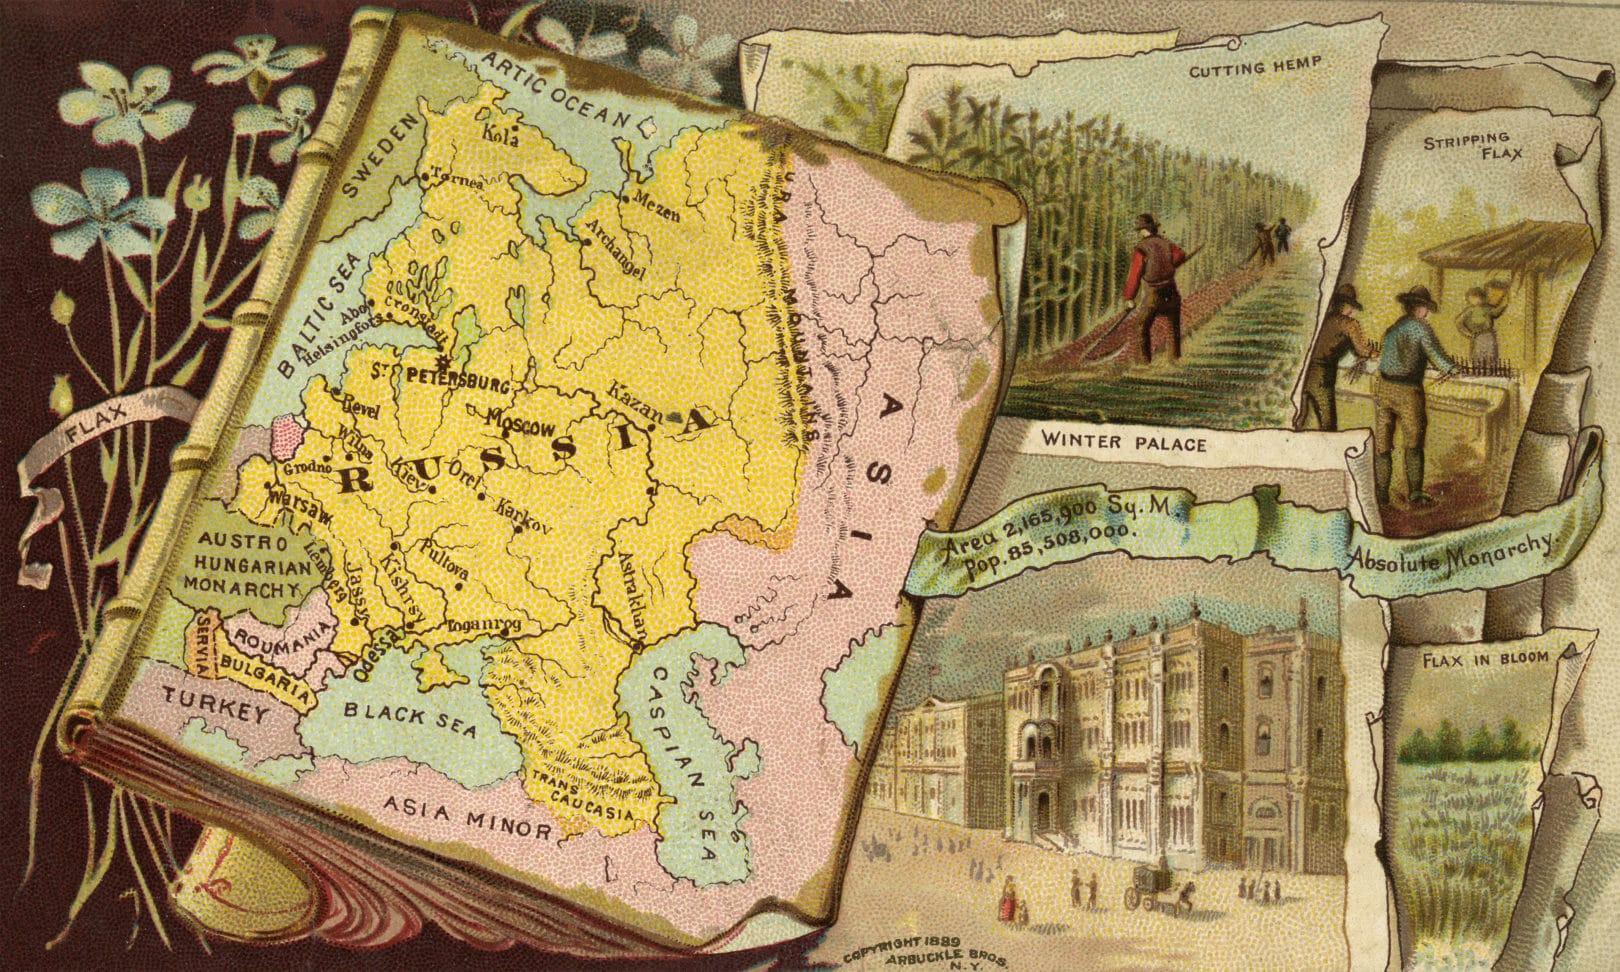 Arbuckle's Coffee postcard, 1889.